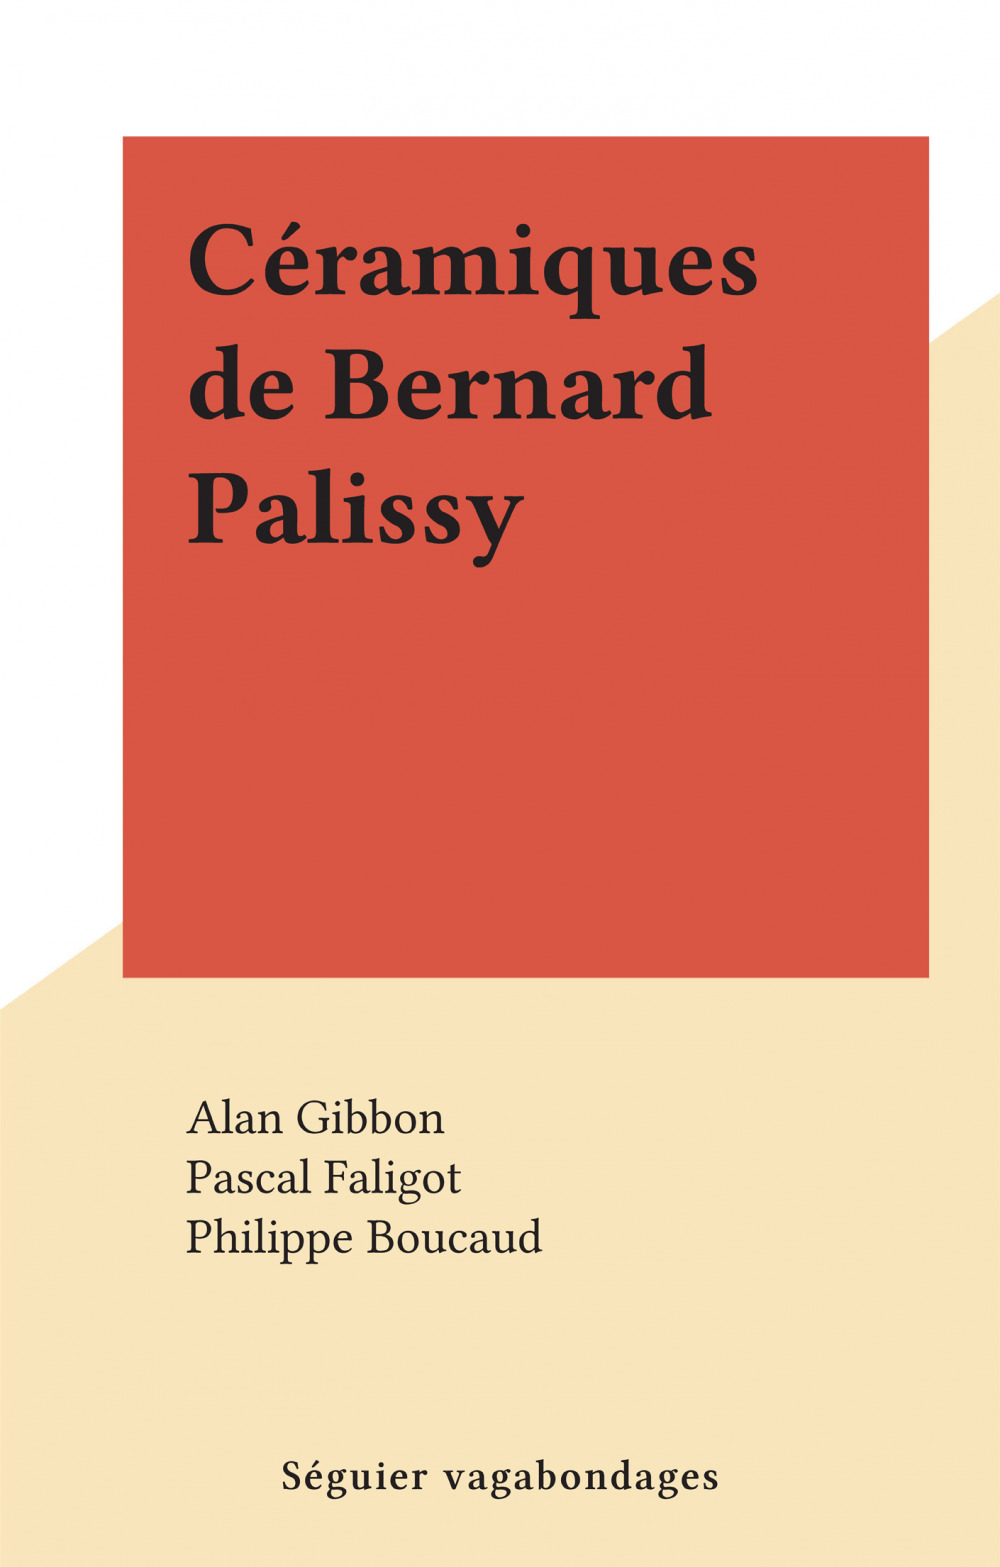 Céramiques de Bernard Palissy